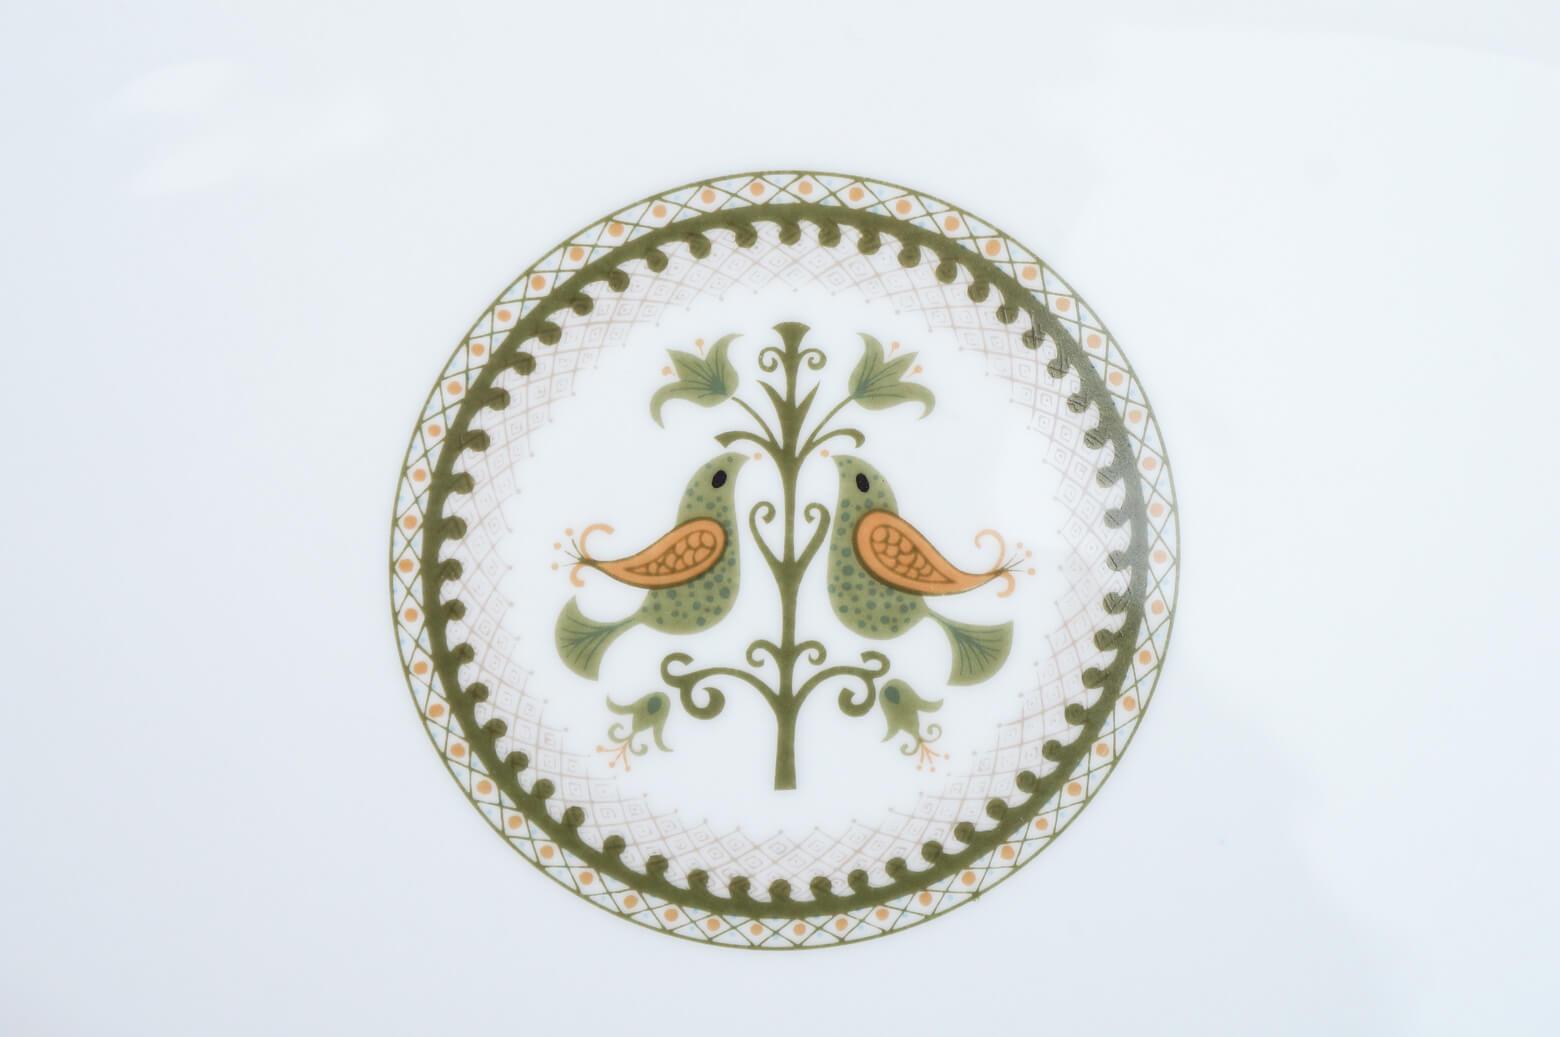 Vintage Noritake Oval Plate Hermitage U.S. Pattern Tableware/ノリタケ オーバル プレート エルミタージュ テーブルウェア レトロ ヴィンテージ食器 Lサイズ